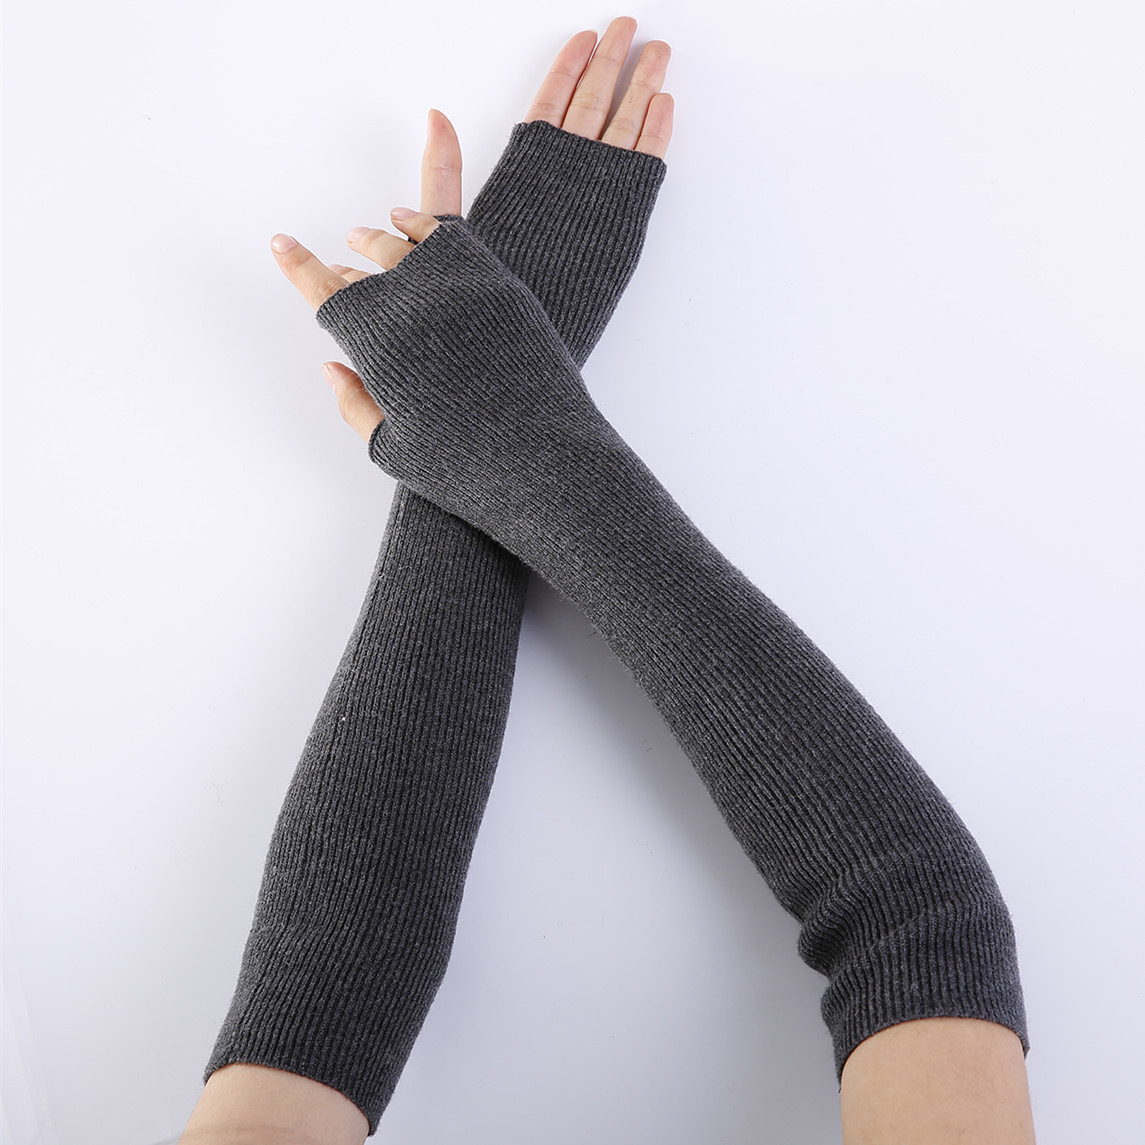 Armstulpen Damen-accessoires 2018 Winter Reine Farbe Wolle Weiche Modische Warme Handschuhe Finger Kaschmir Halb Arme Arm Wärmer 1 Paar